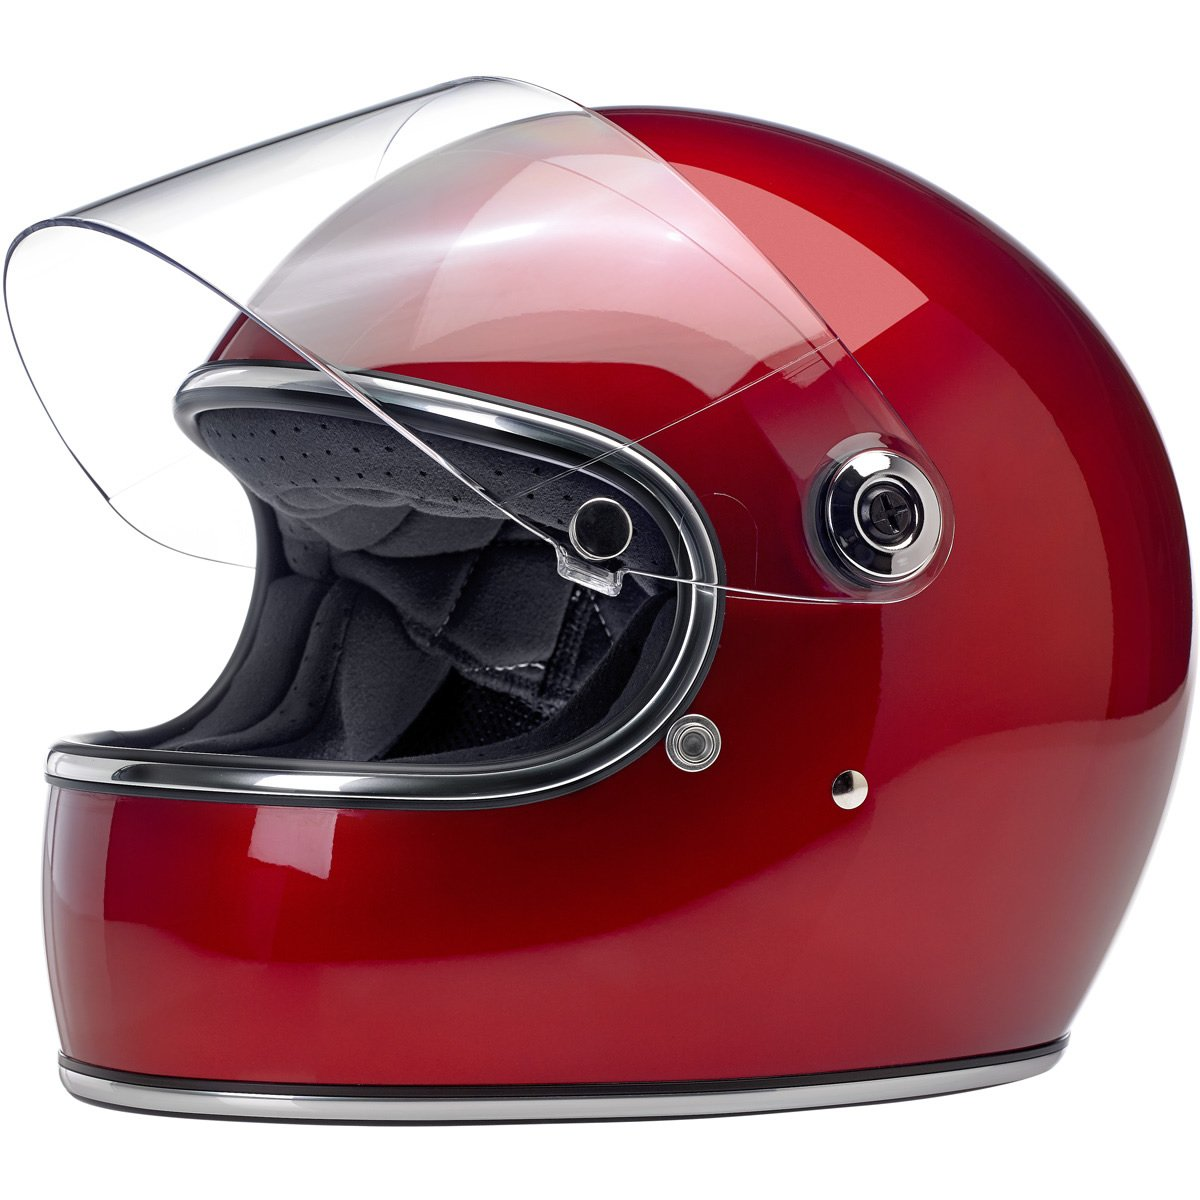 Cast Gringo Helmet Biltwell Key FOB